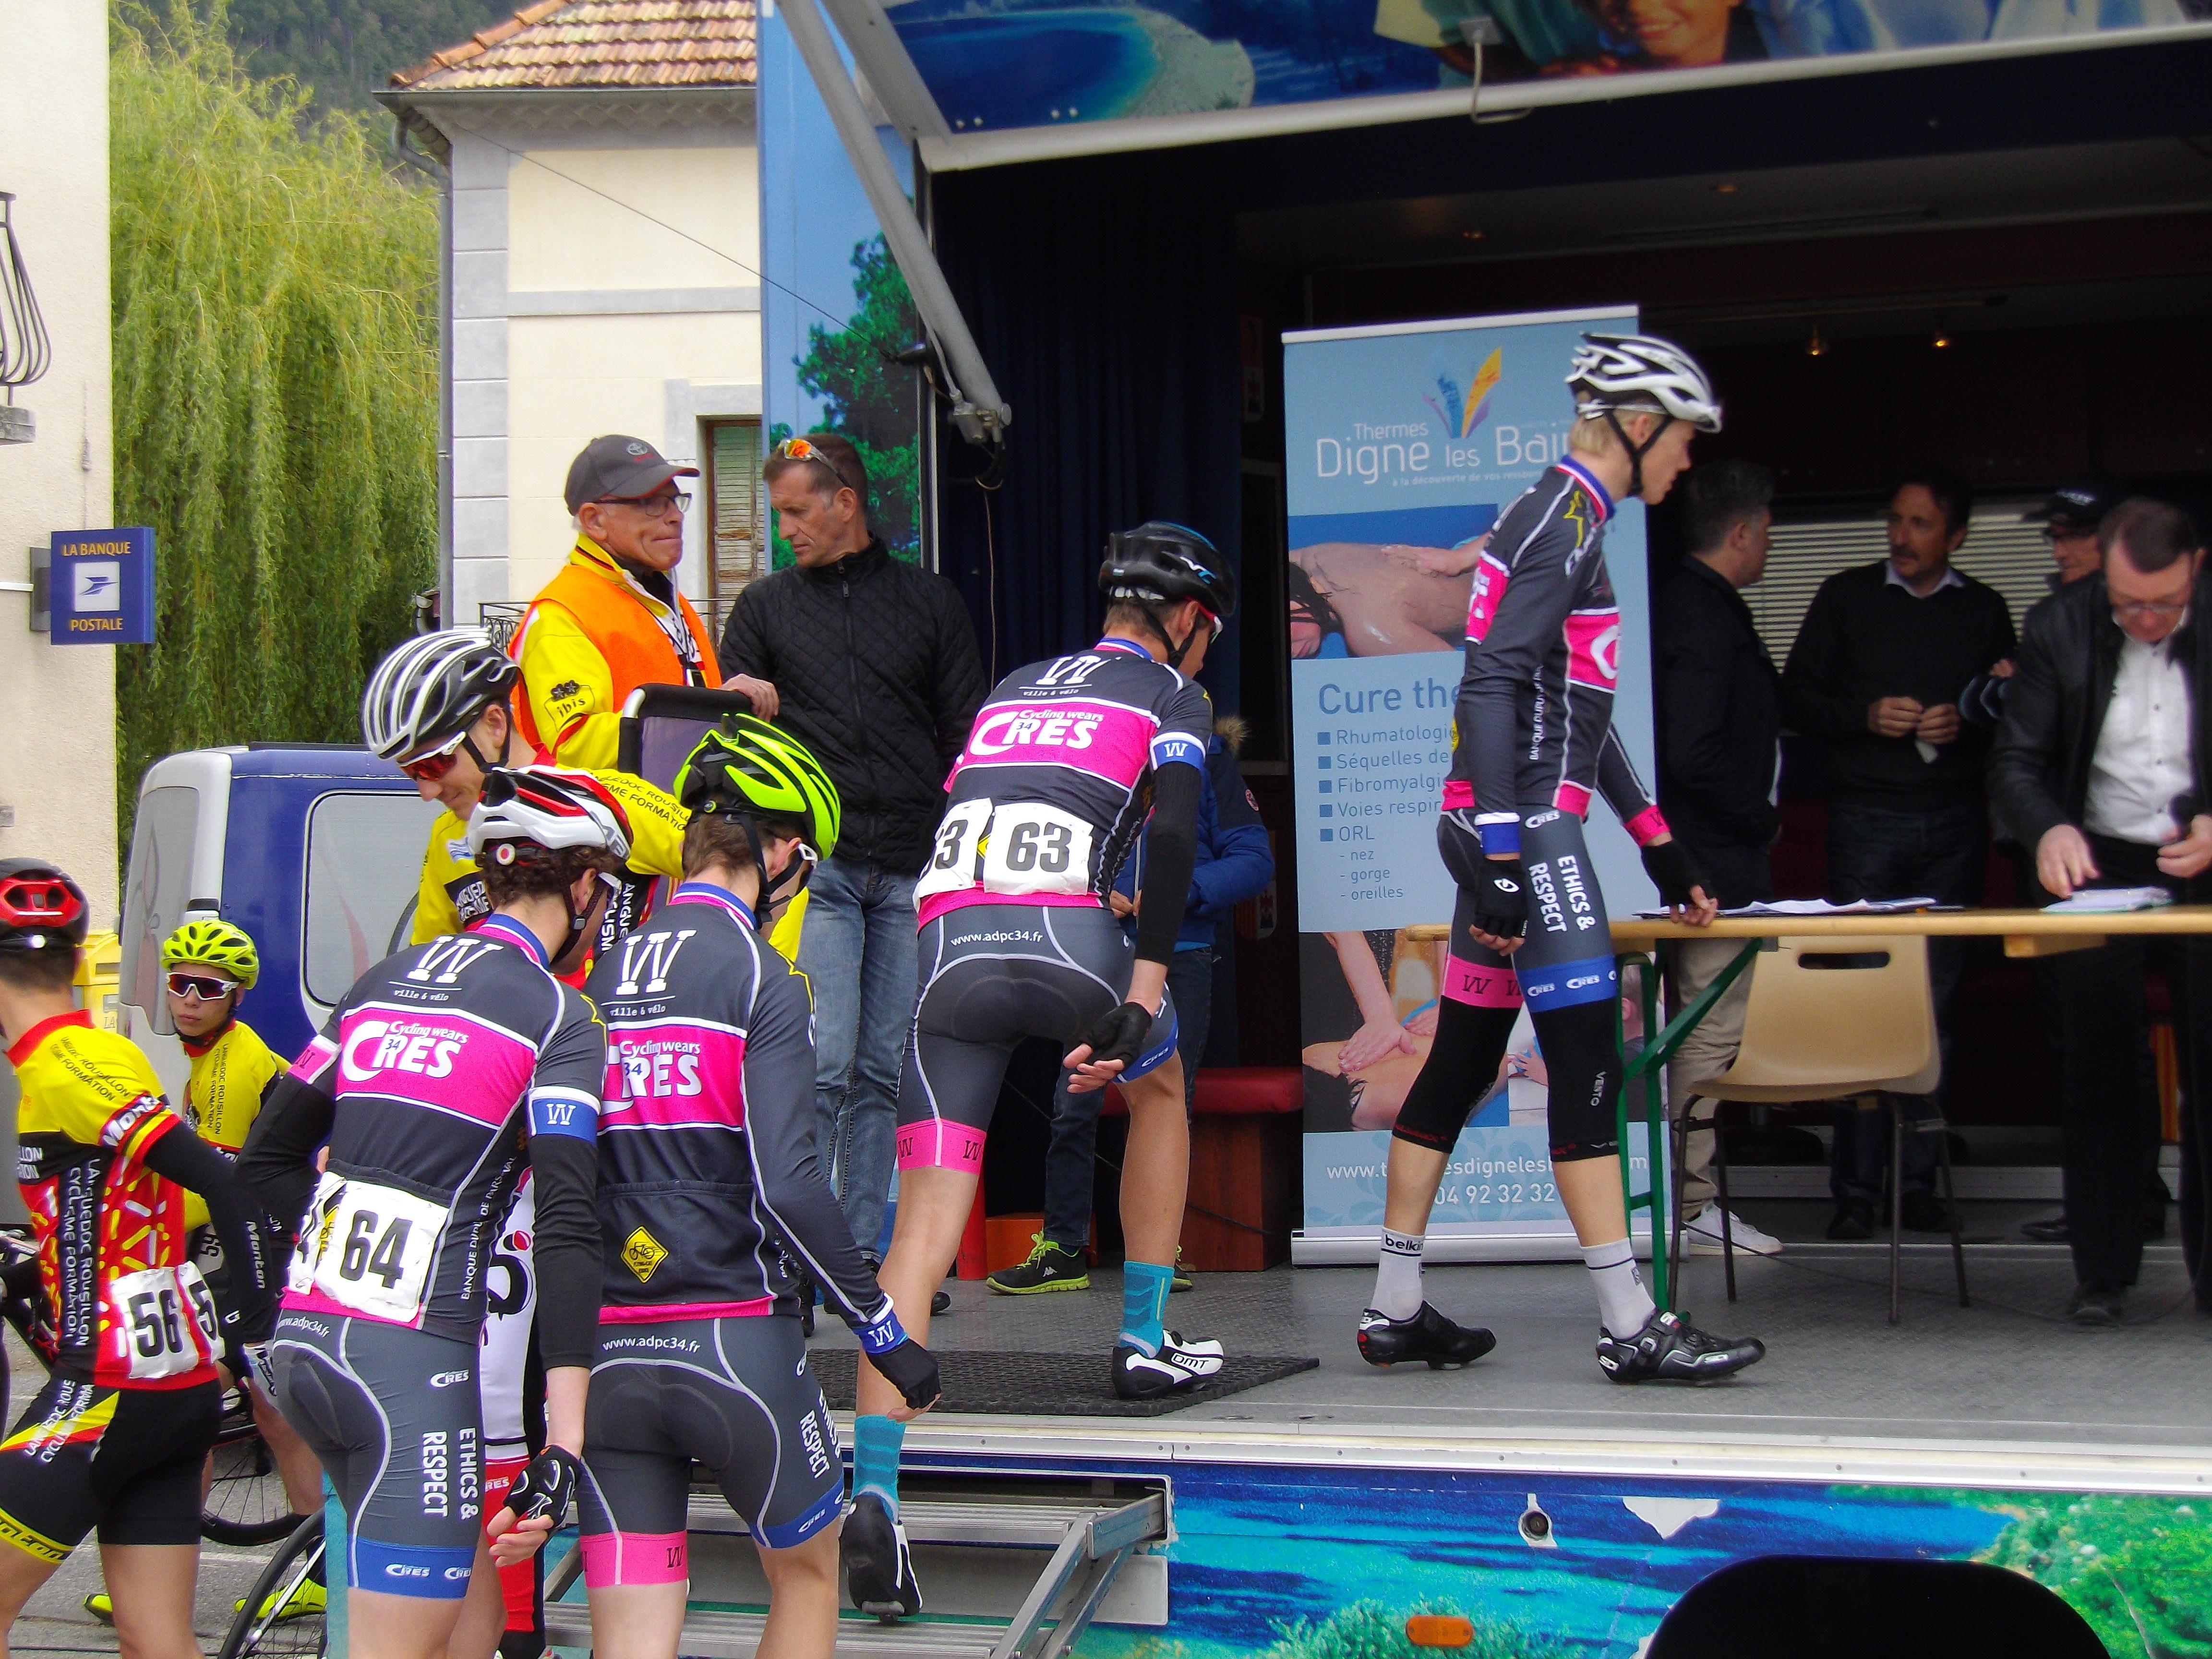 présentation podium 4ème étape Paca